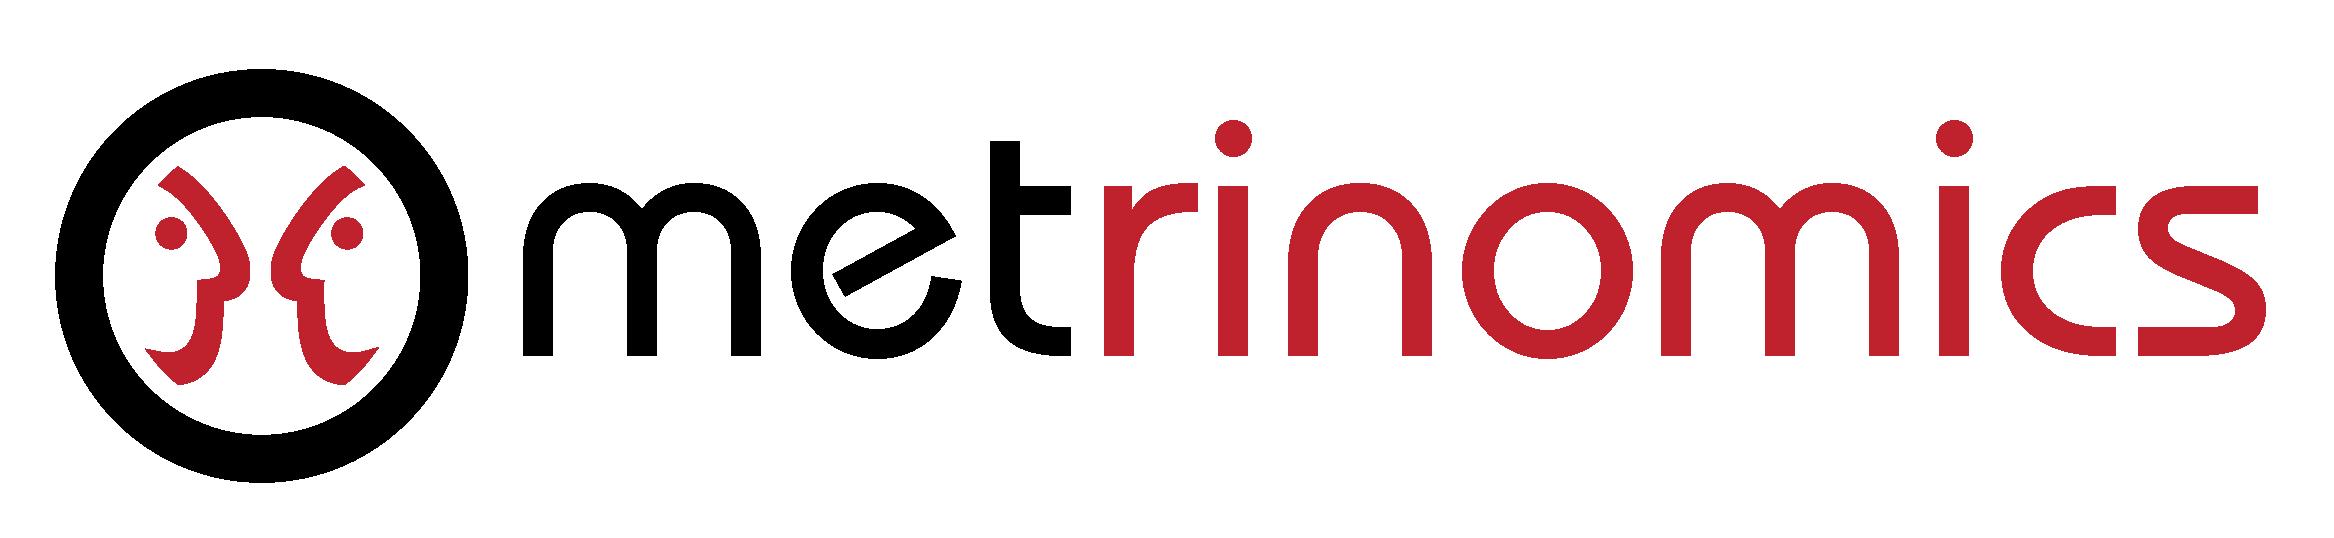 metrinomics_logo_highres300